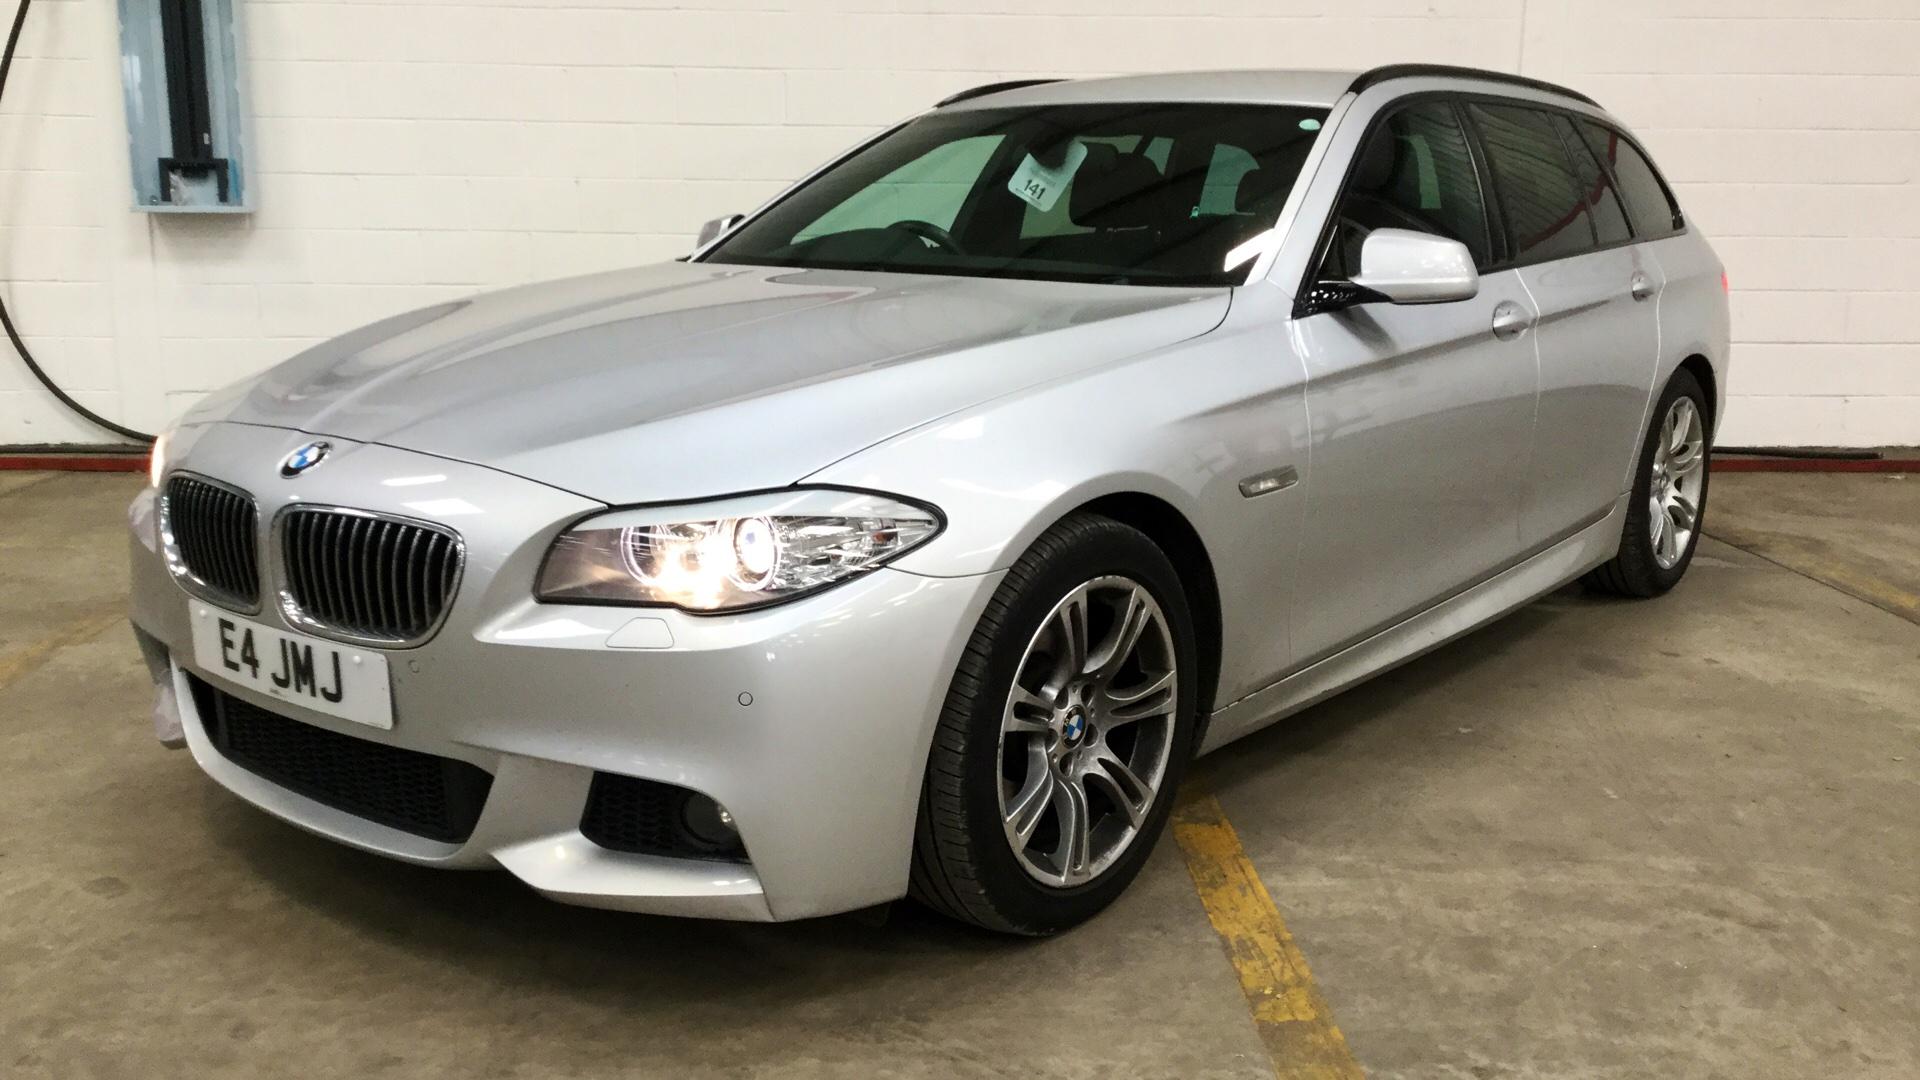 BMW 5 Series: Engine stop